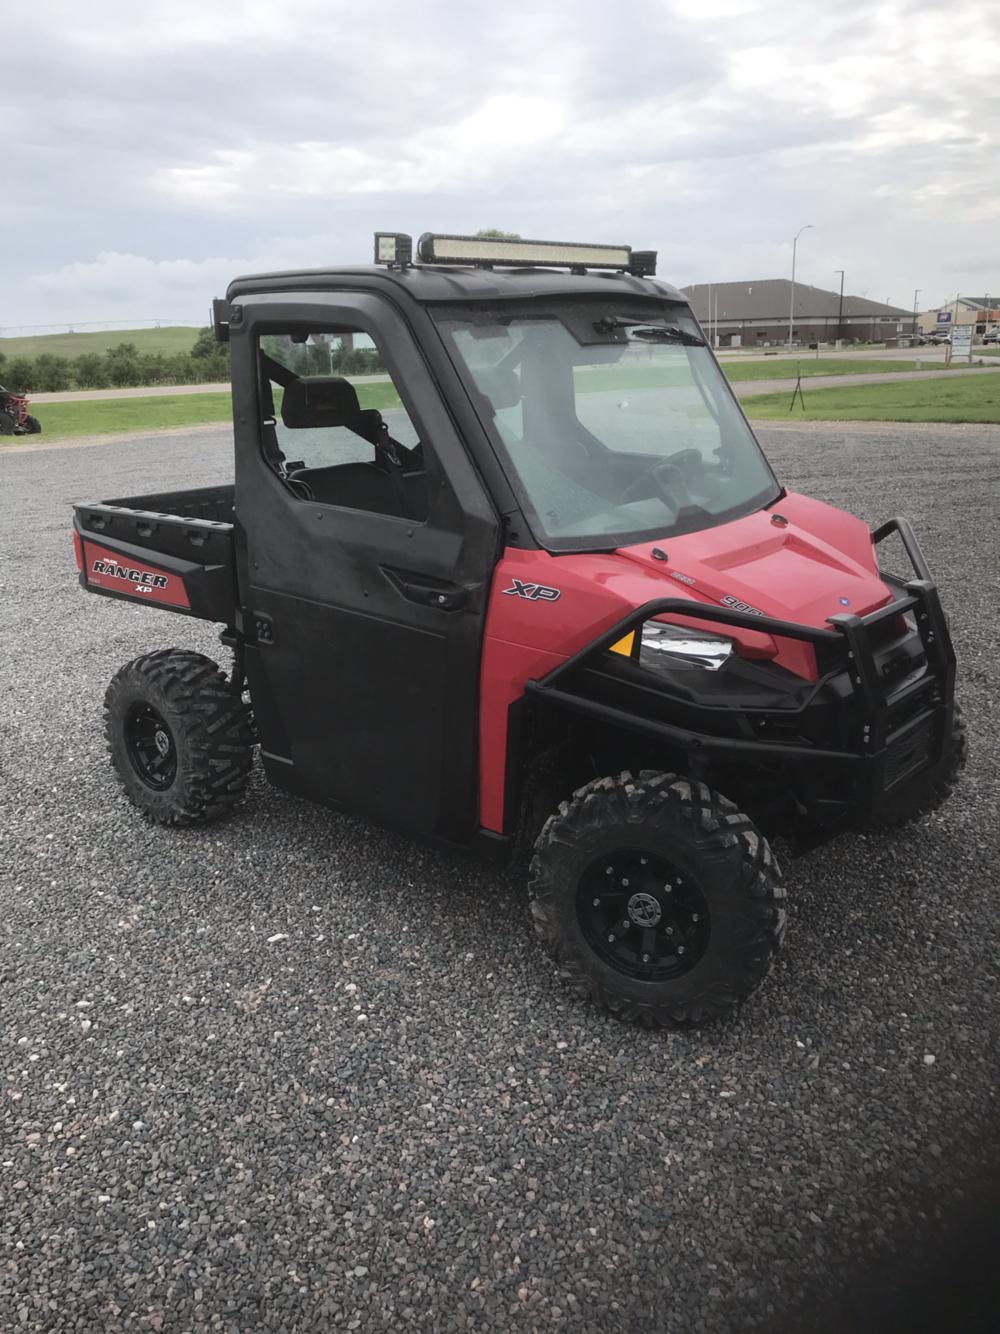 Inventory Ag-Land ATV Broken Bow, NE (308) 872-3424